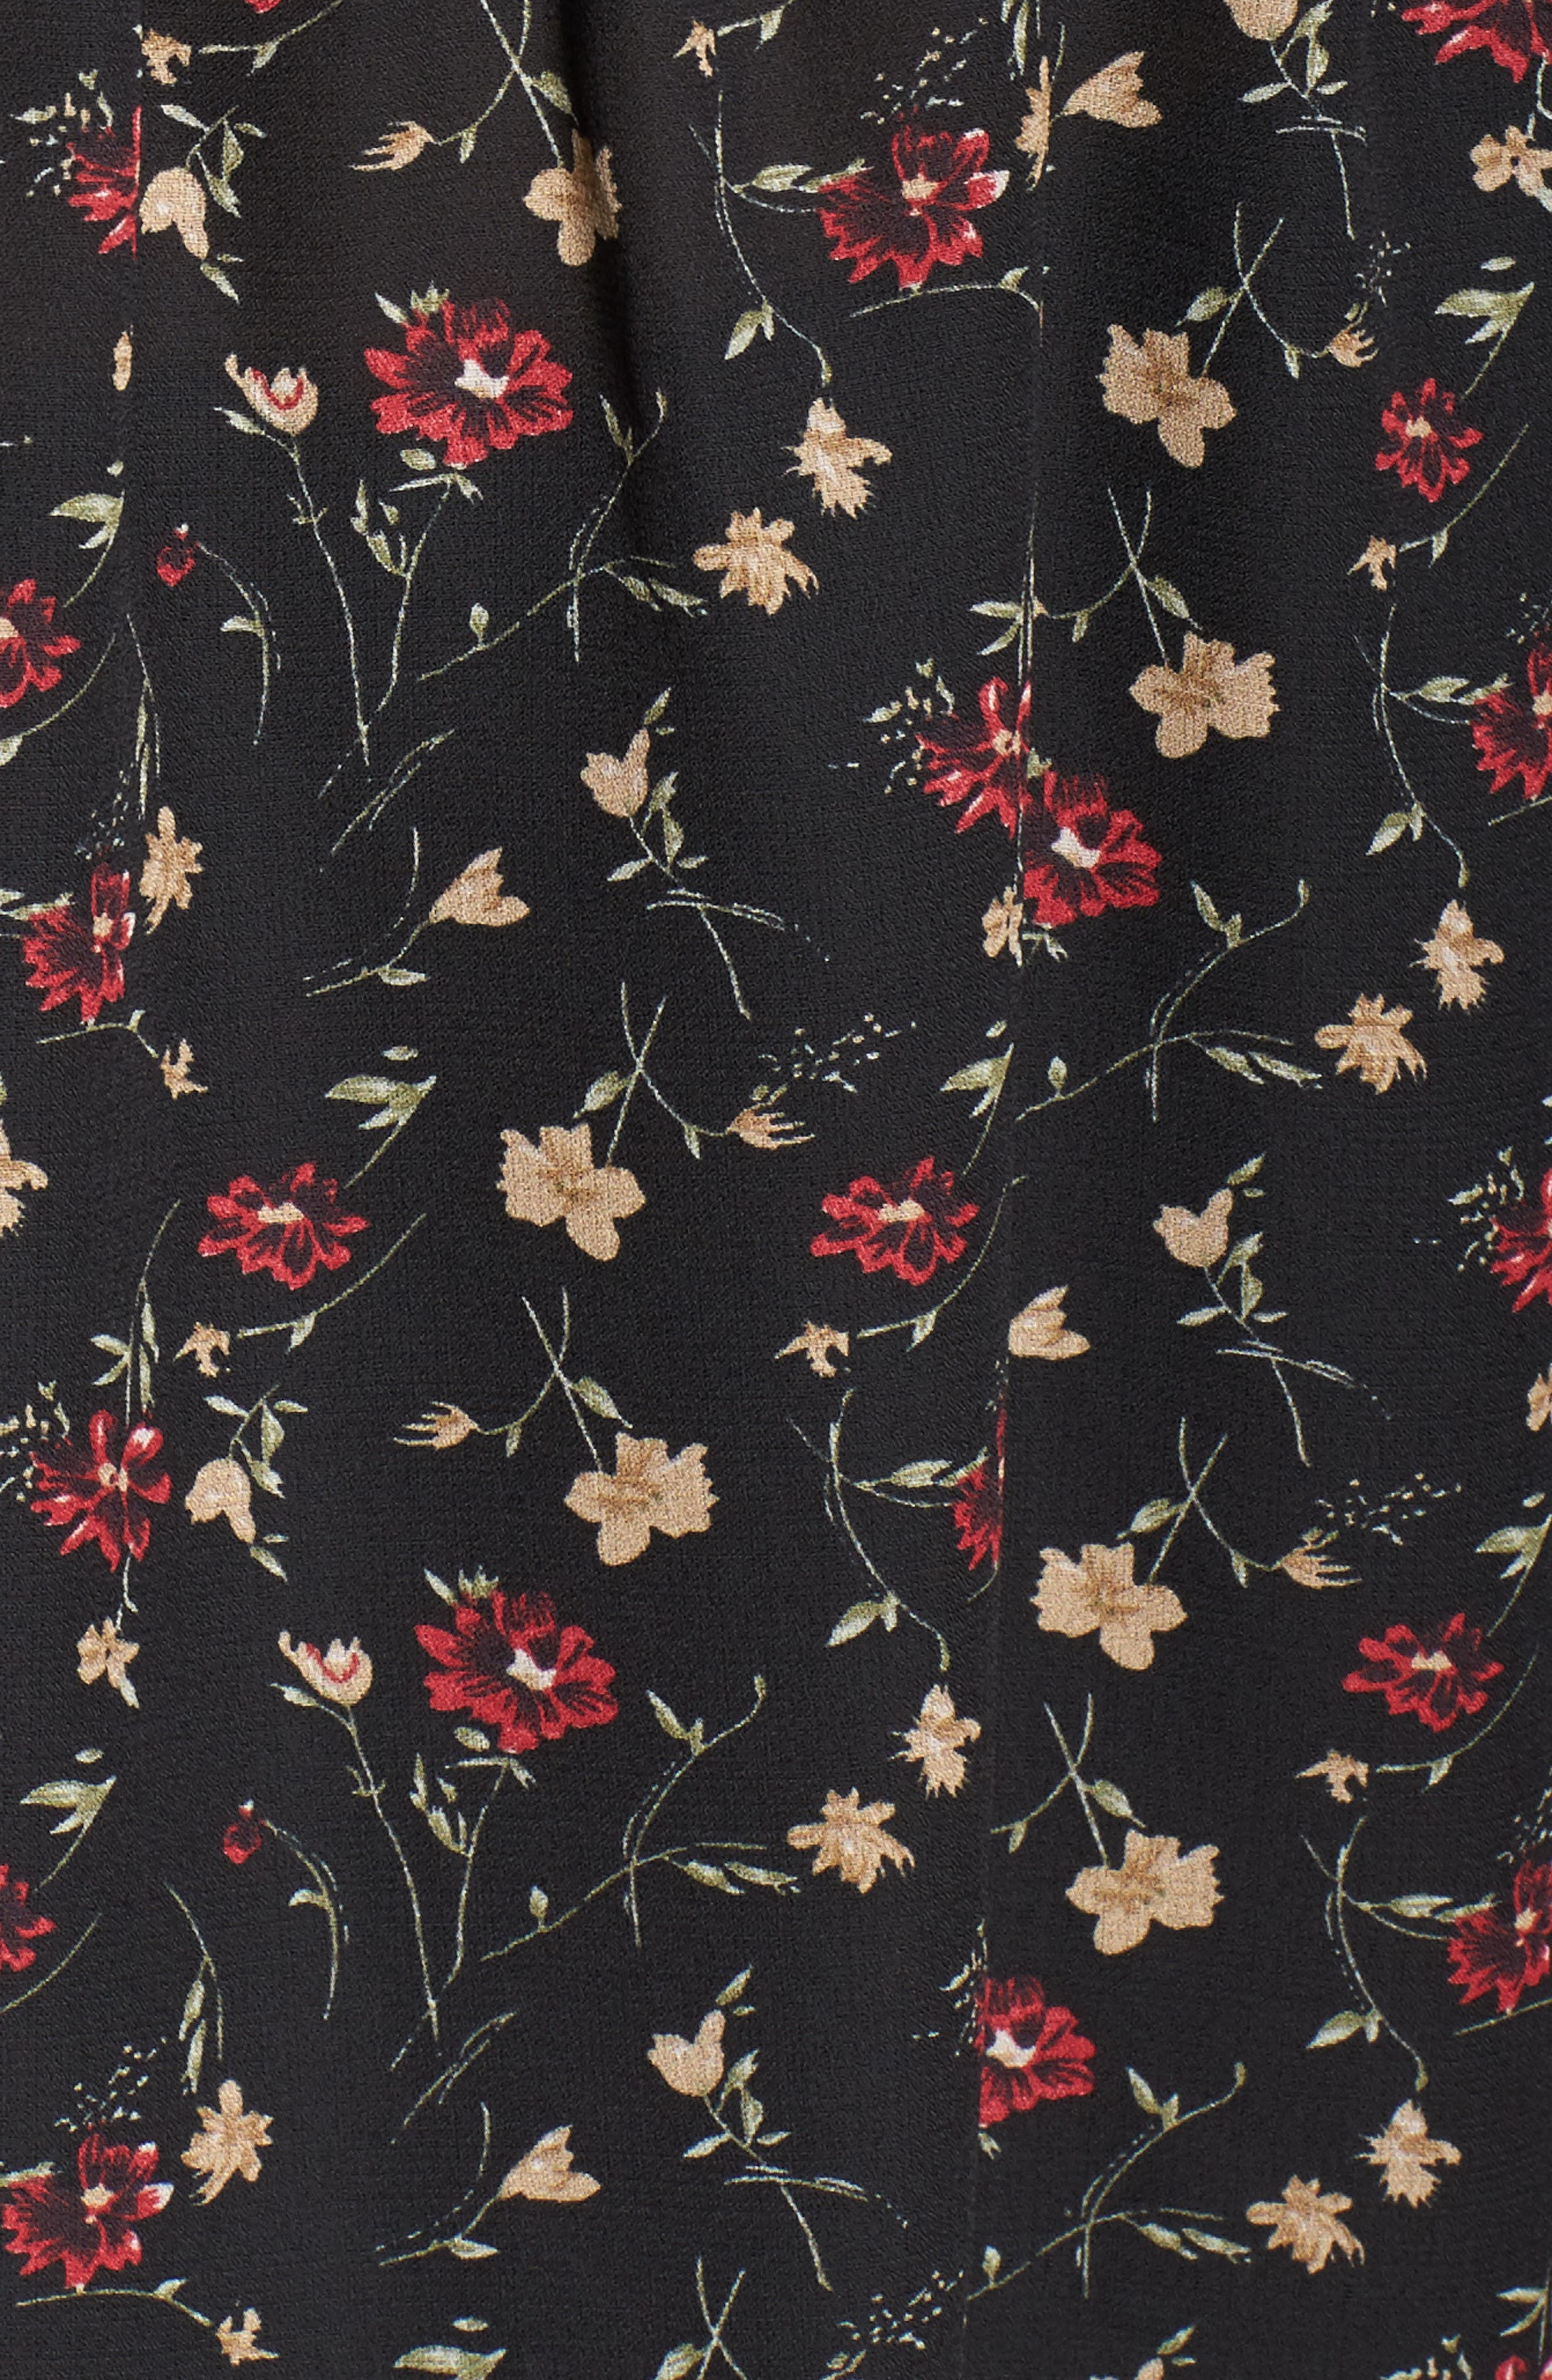 Velvet Tie Floral Blouse,                             Alternate thumbnail 5, color,                             Multi